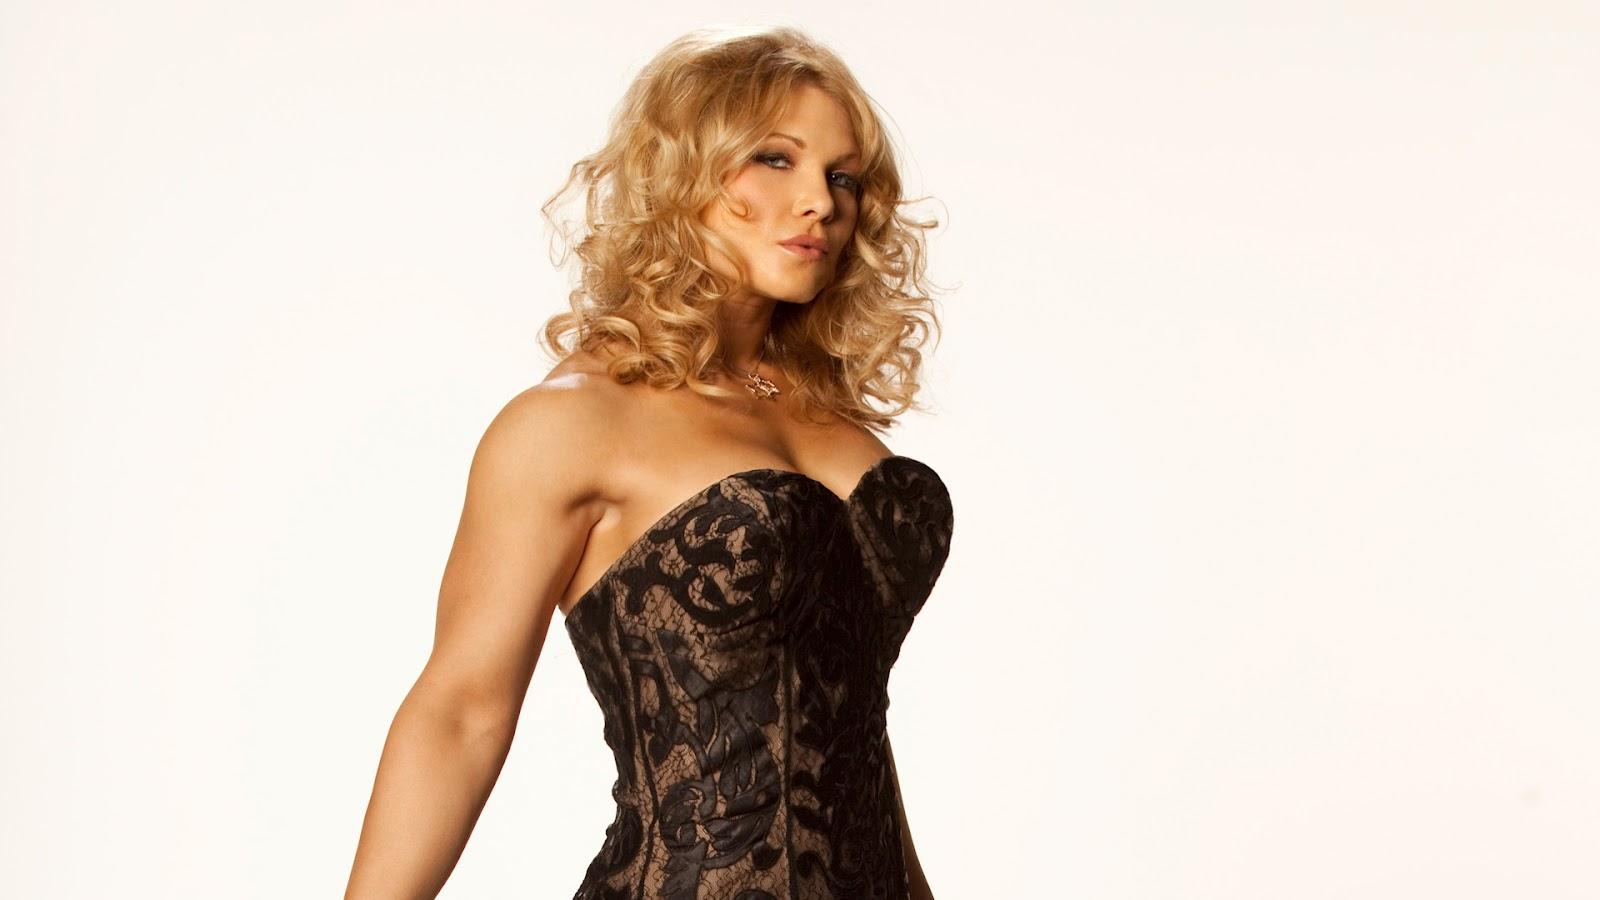 HD wallpapers WWE Super Hot Divas Full HD Wallpapers of Beth Phoenix 1600x900